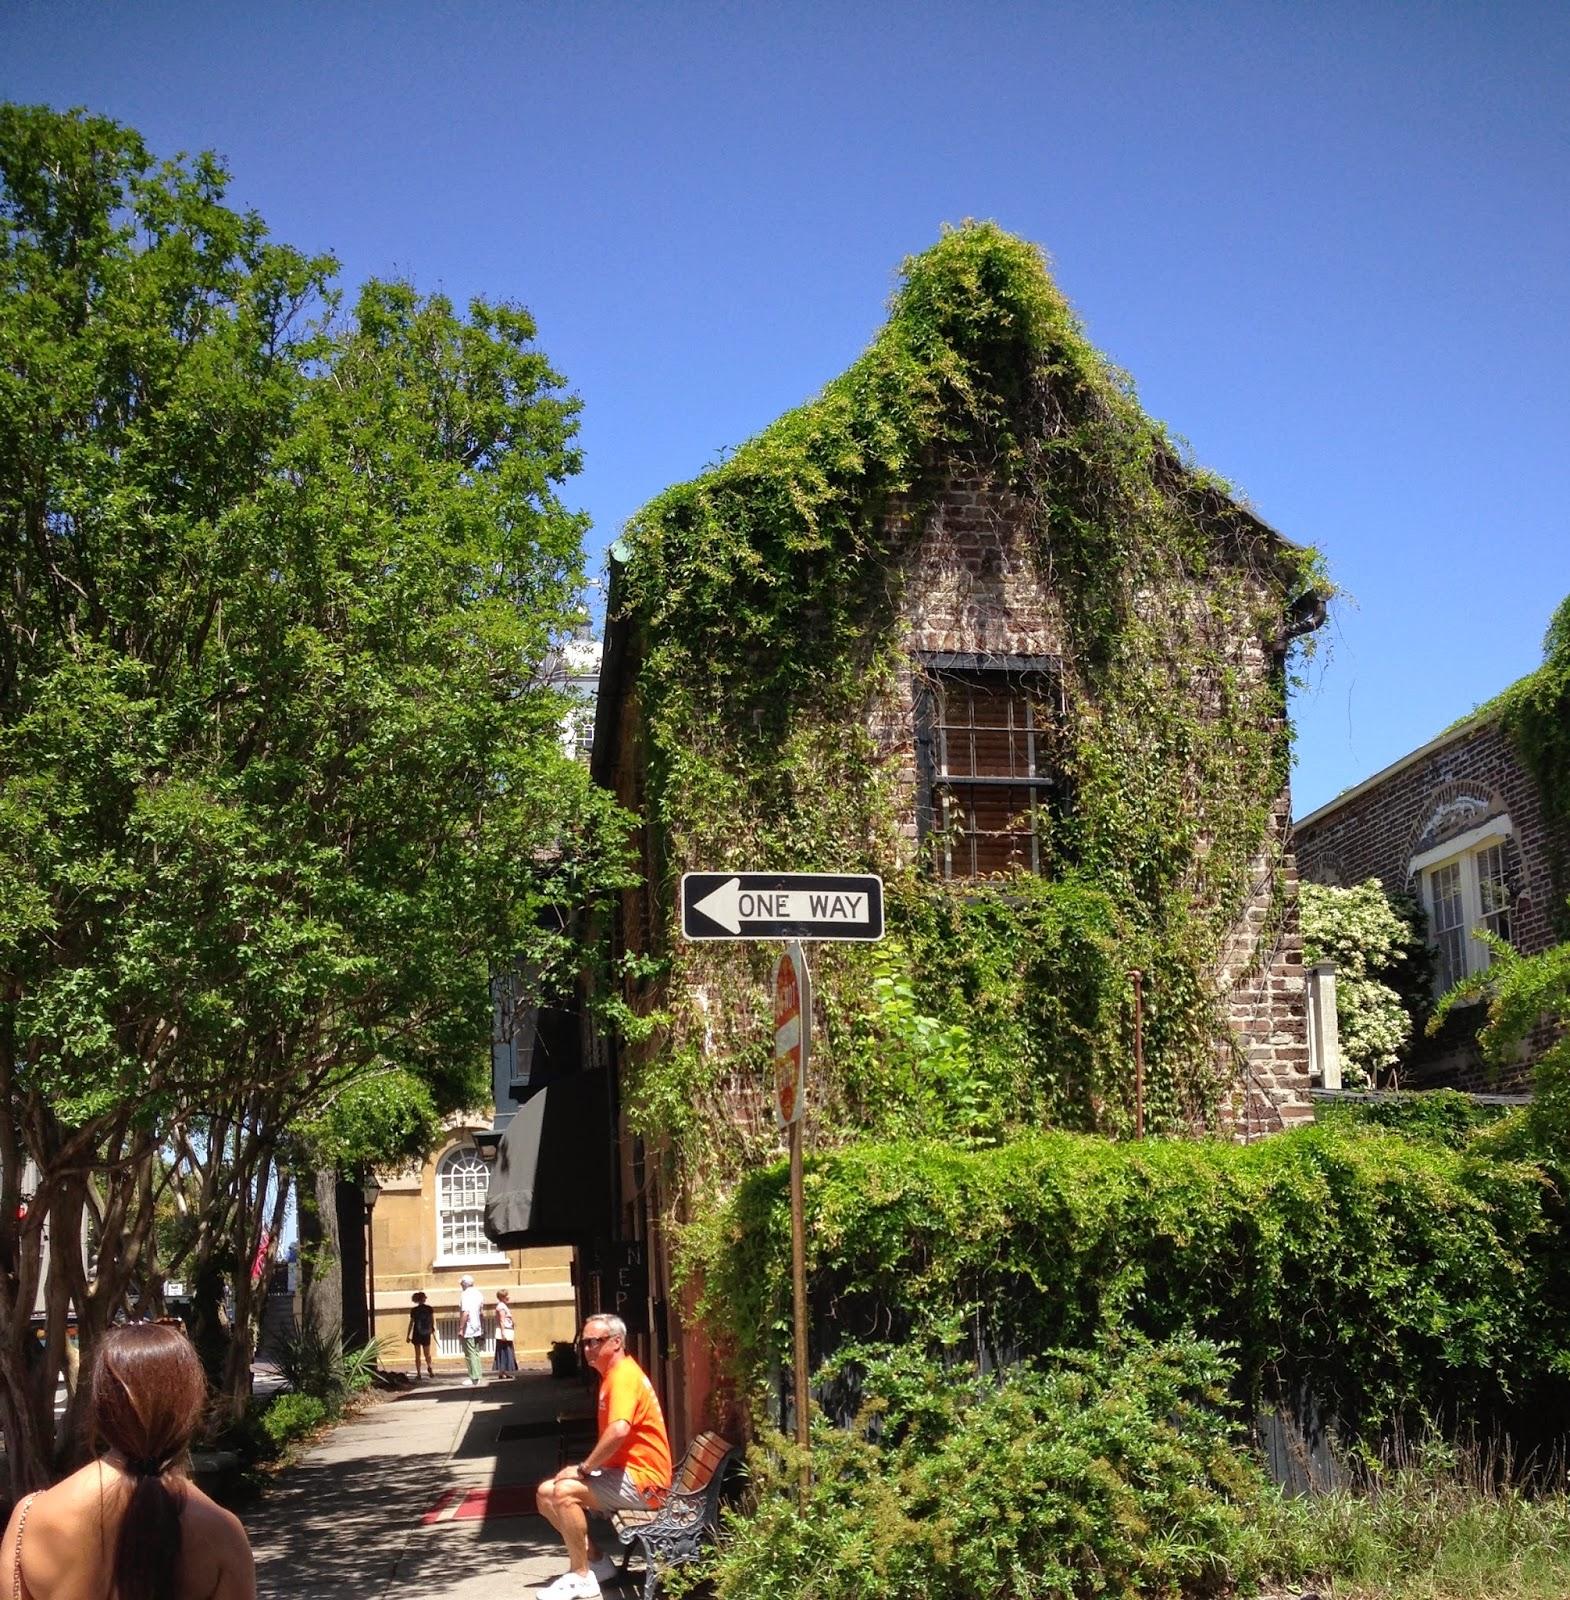 Historic Downtown Charleston Sc: Our Adventures: Historic Charleston, South Carolina